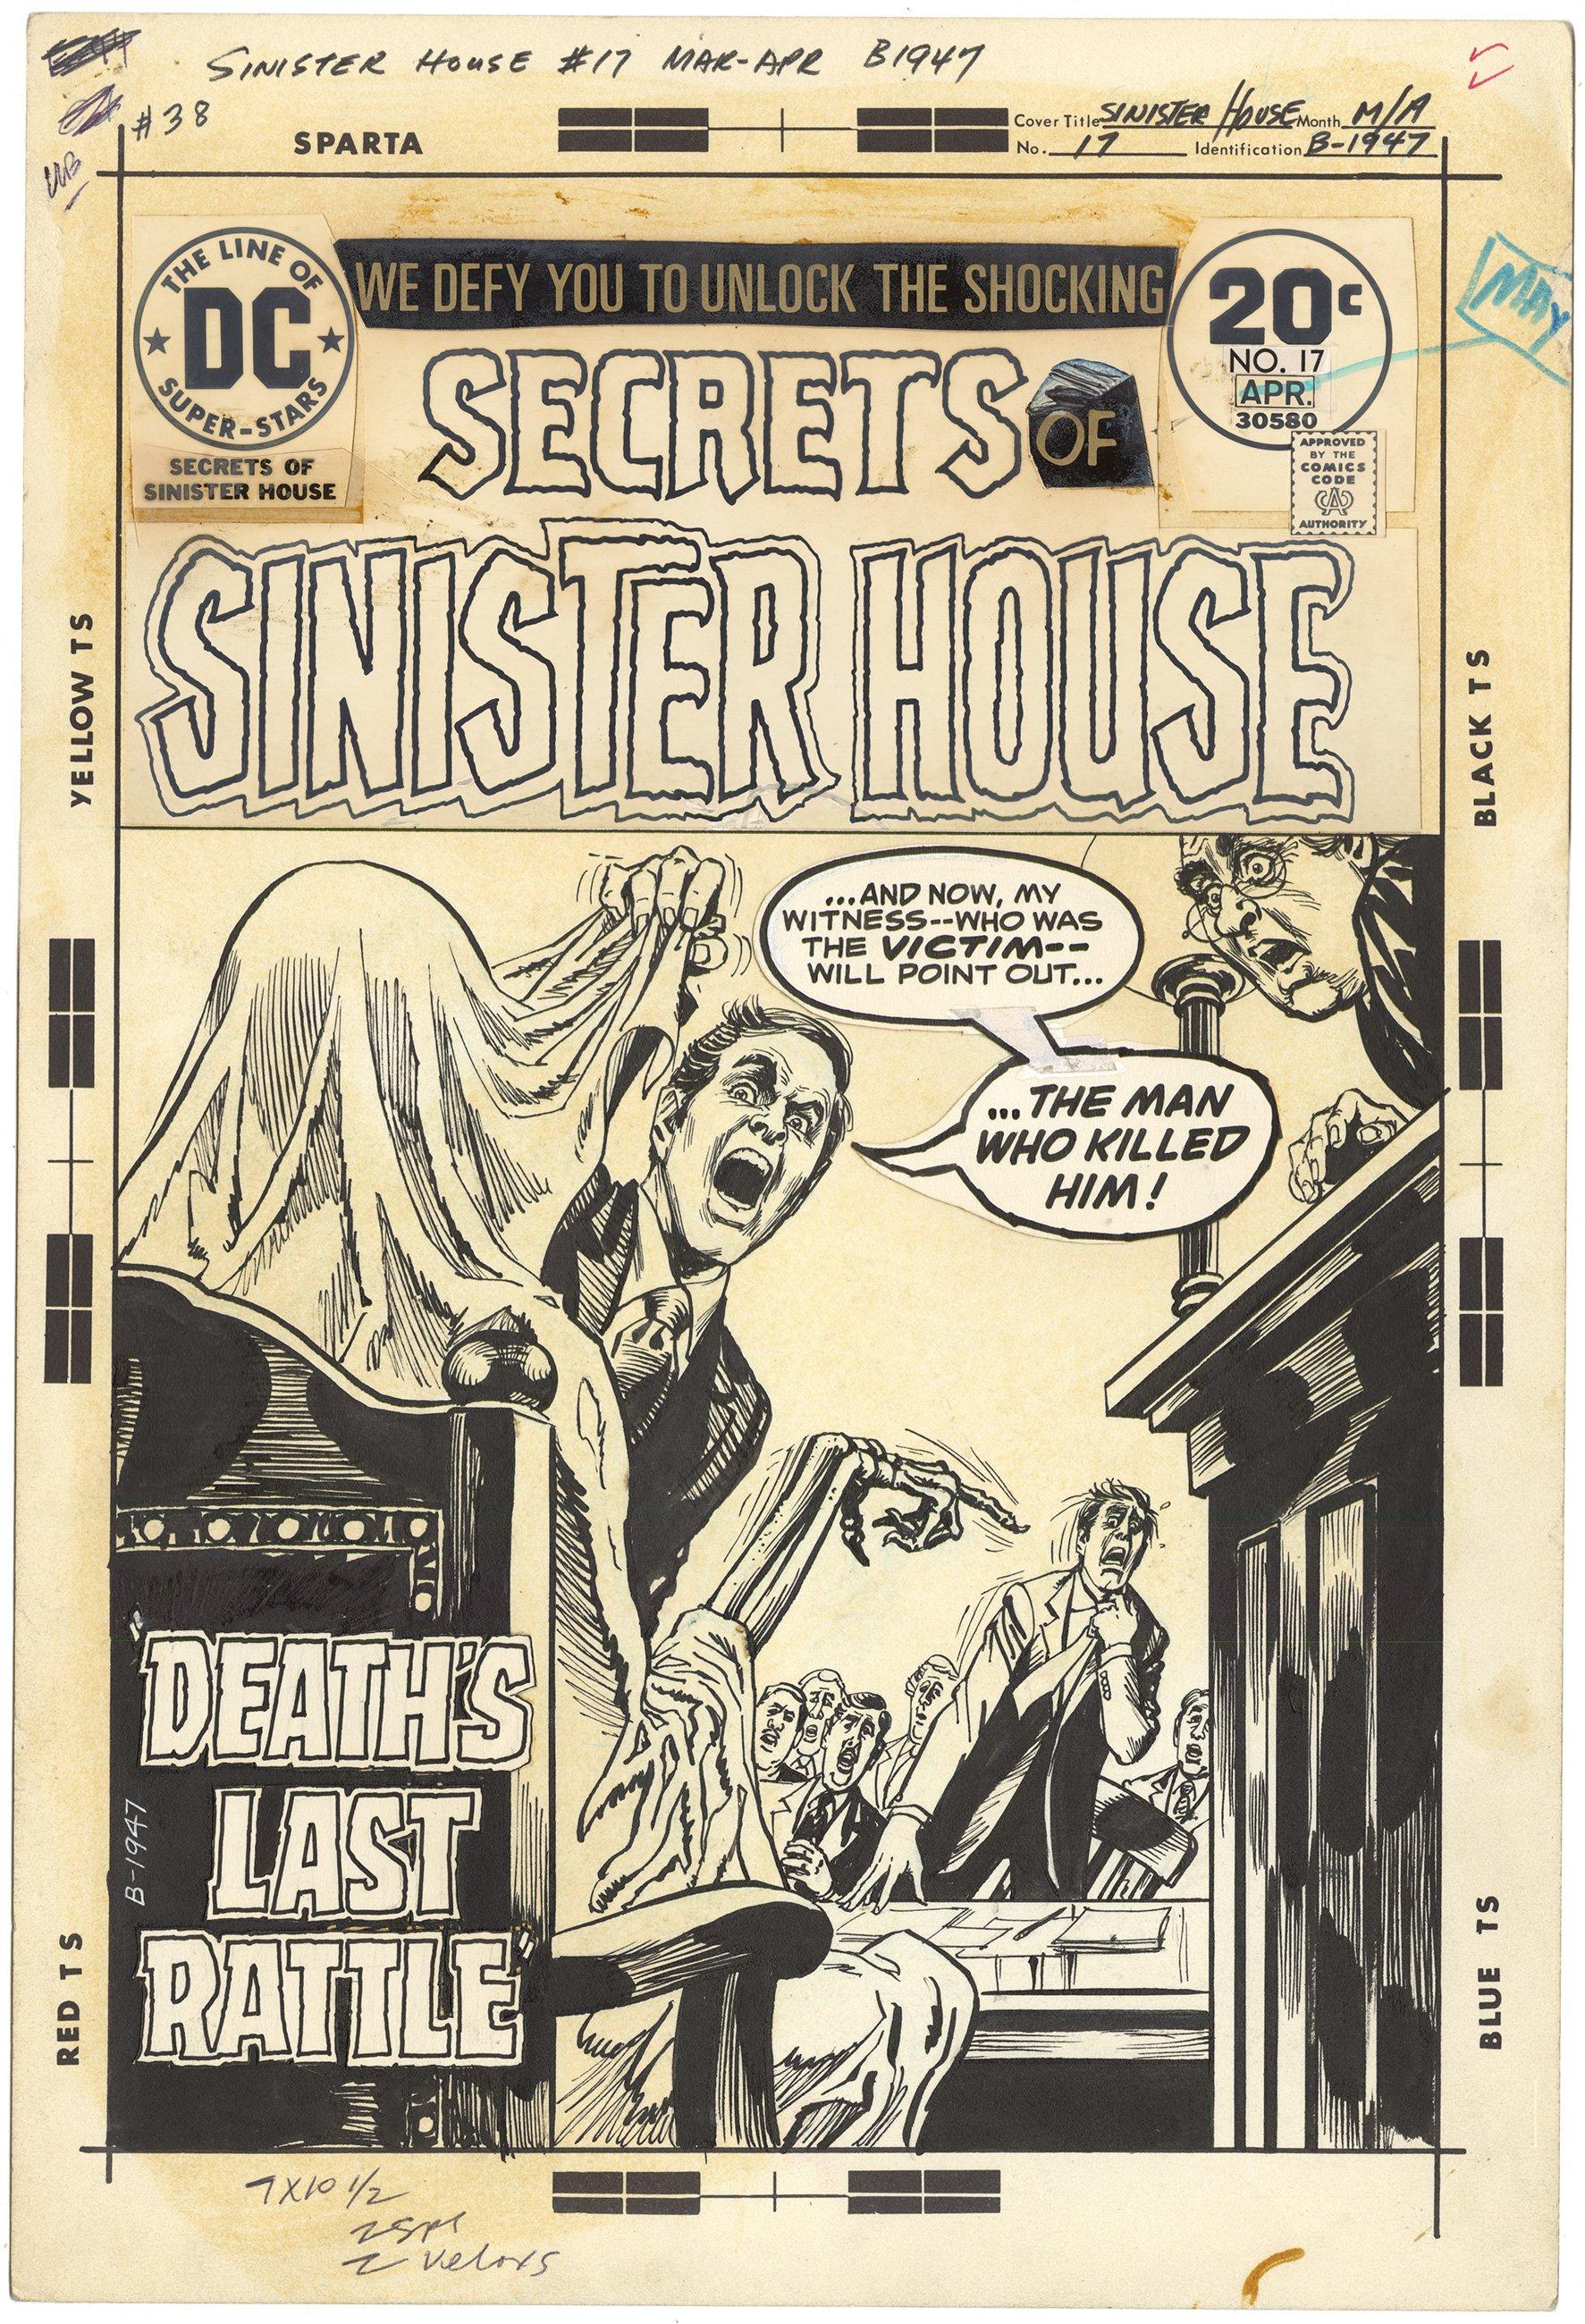 Secrets of Sinister House #17 Cover